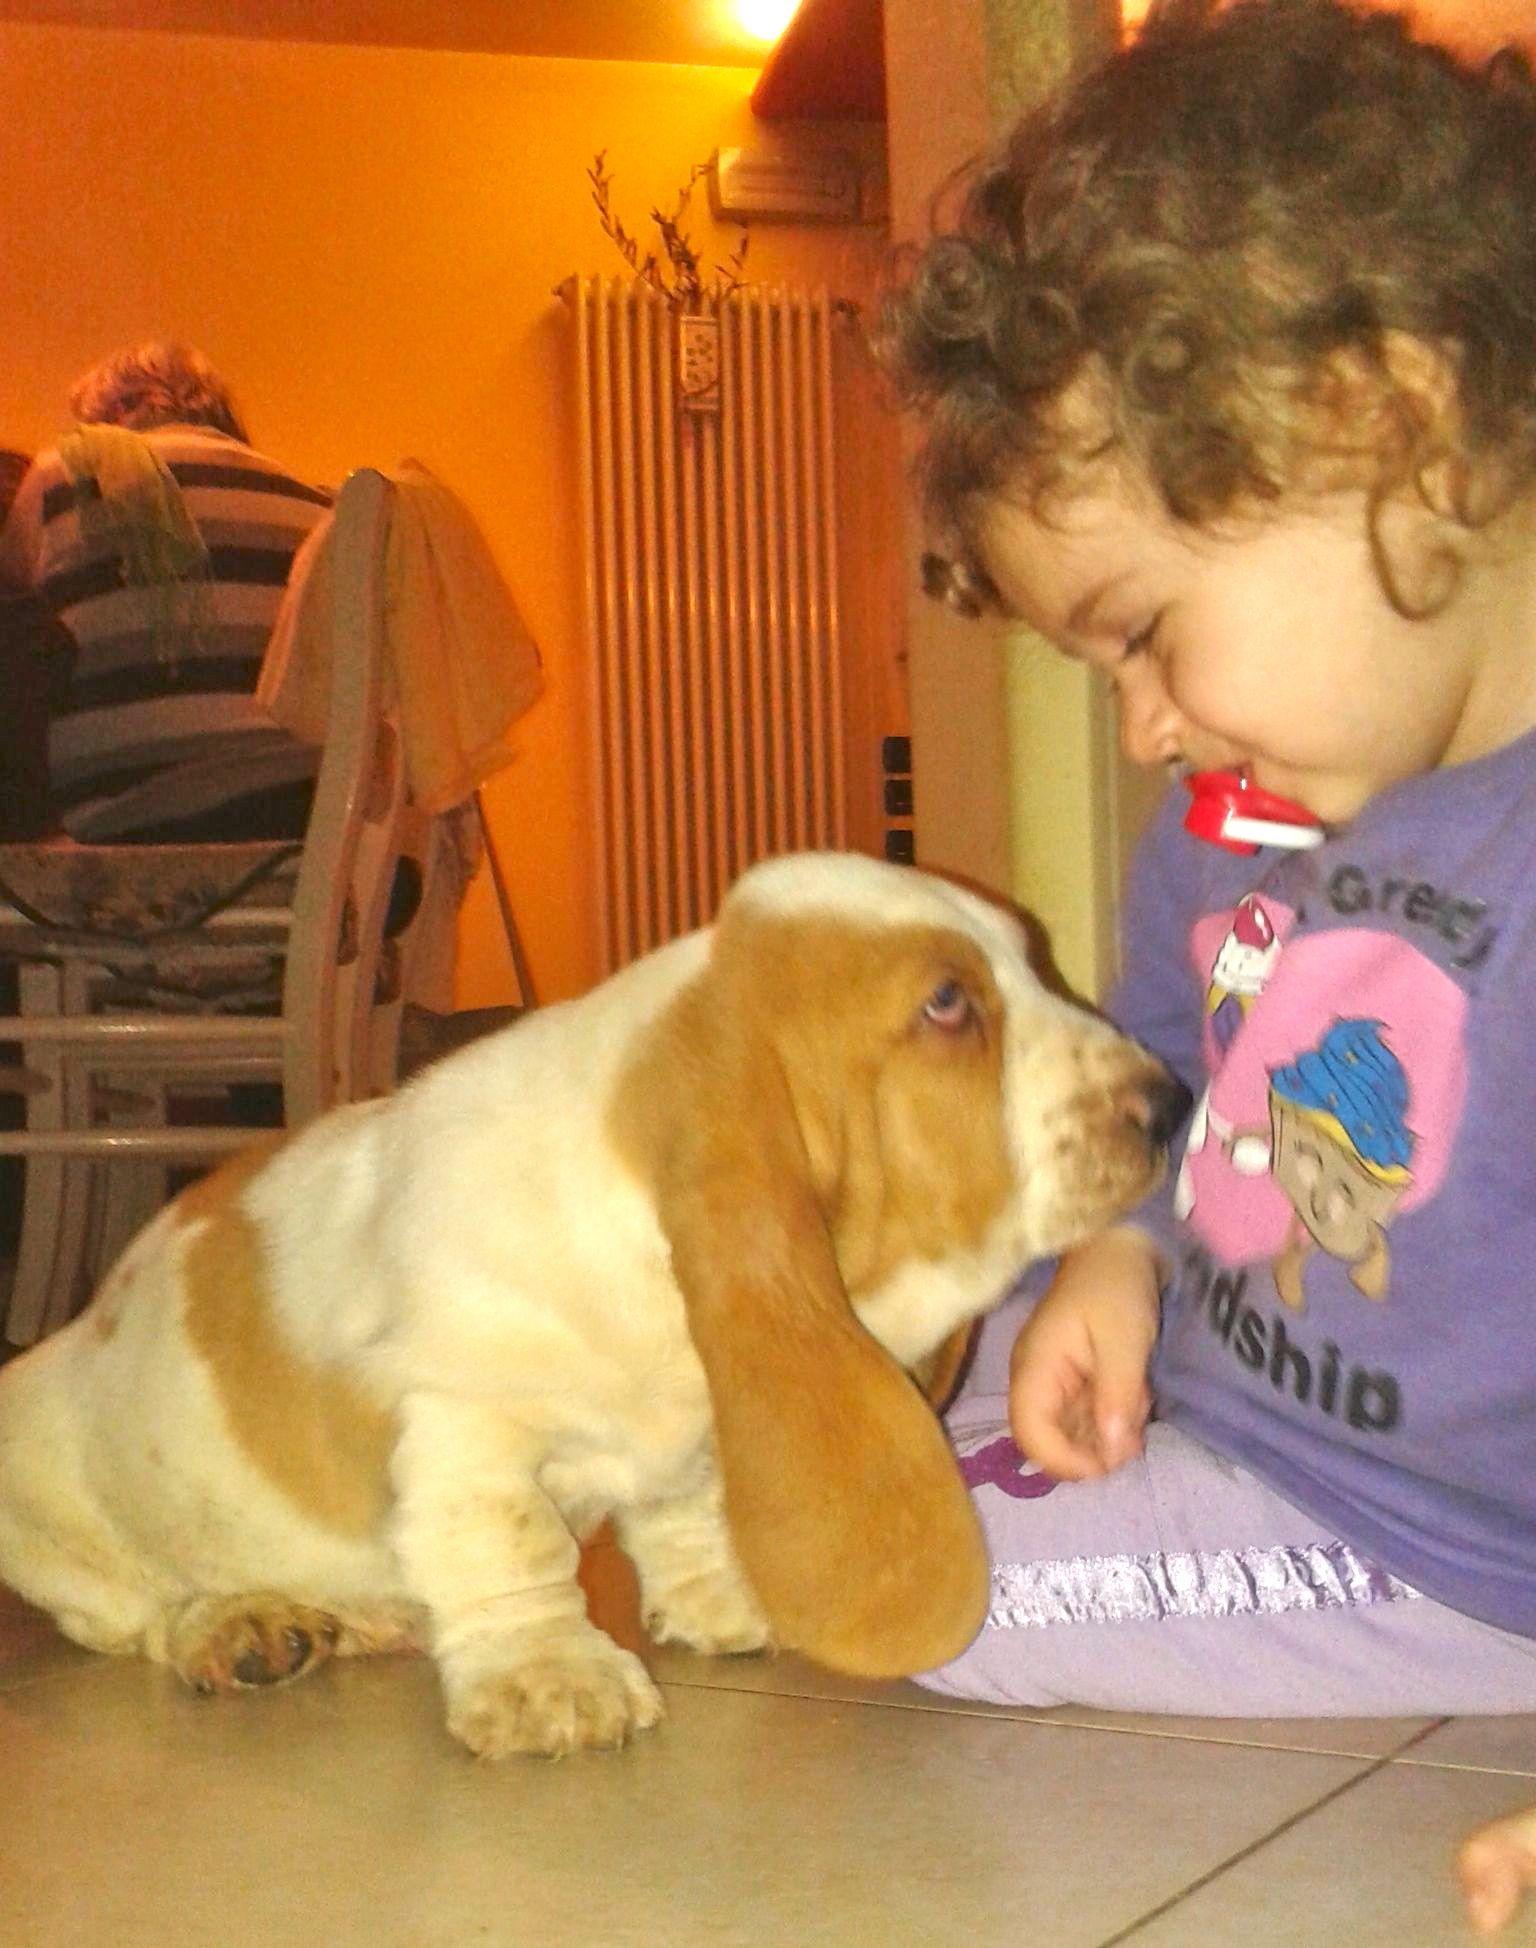 Basset Hound in casa - basset e bimba